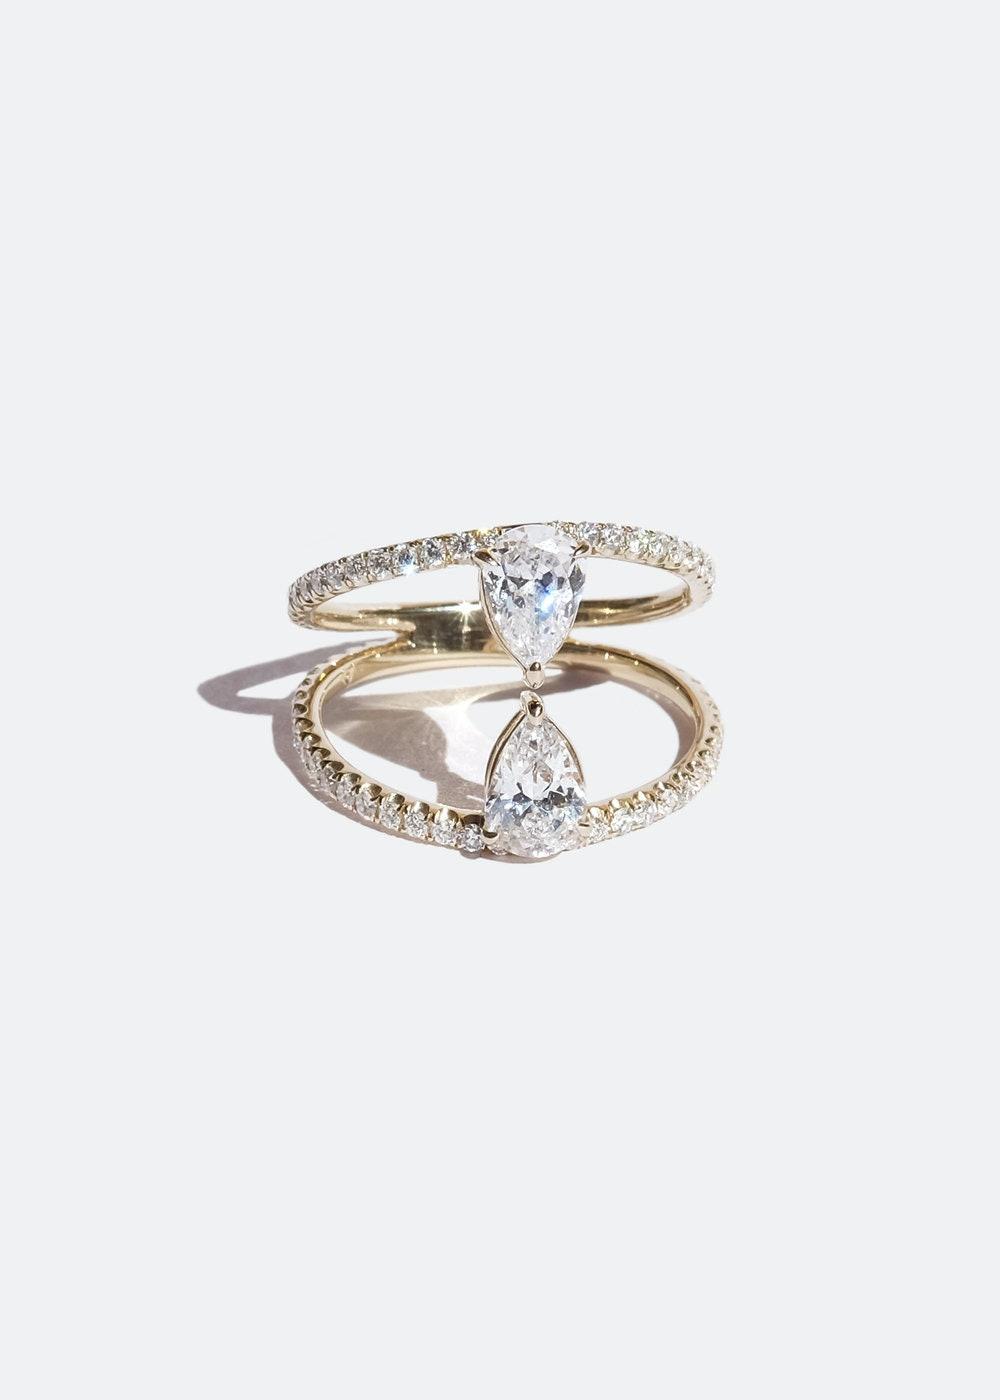 Engagement Making 9 Unique Designers The Ring Pieces Indie Most VUGMLqSzp